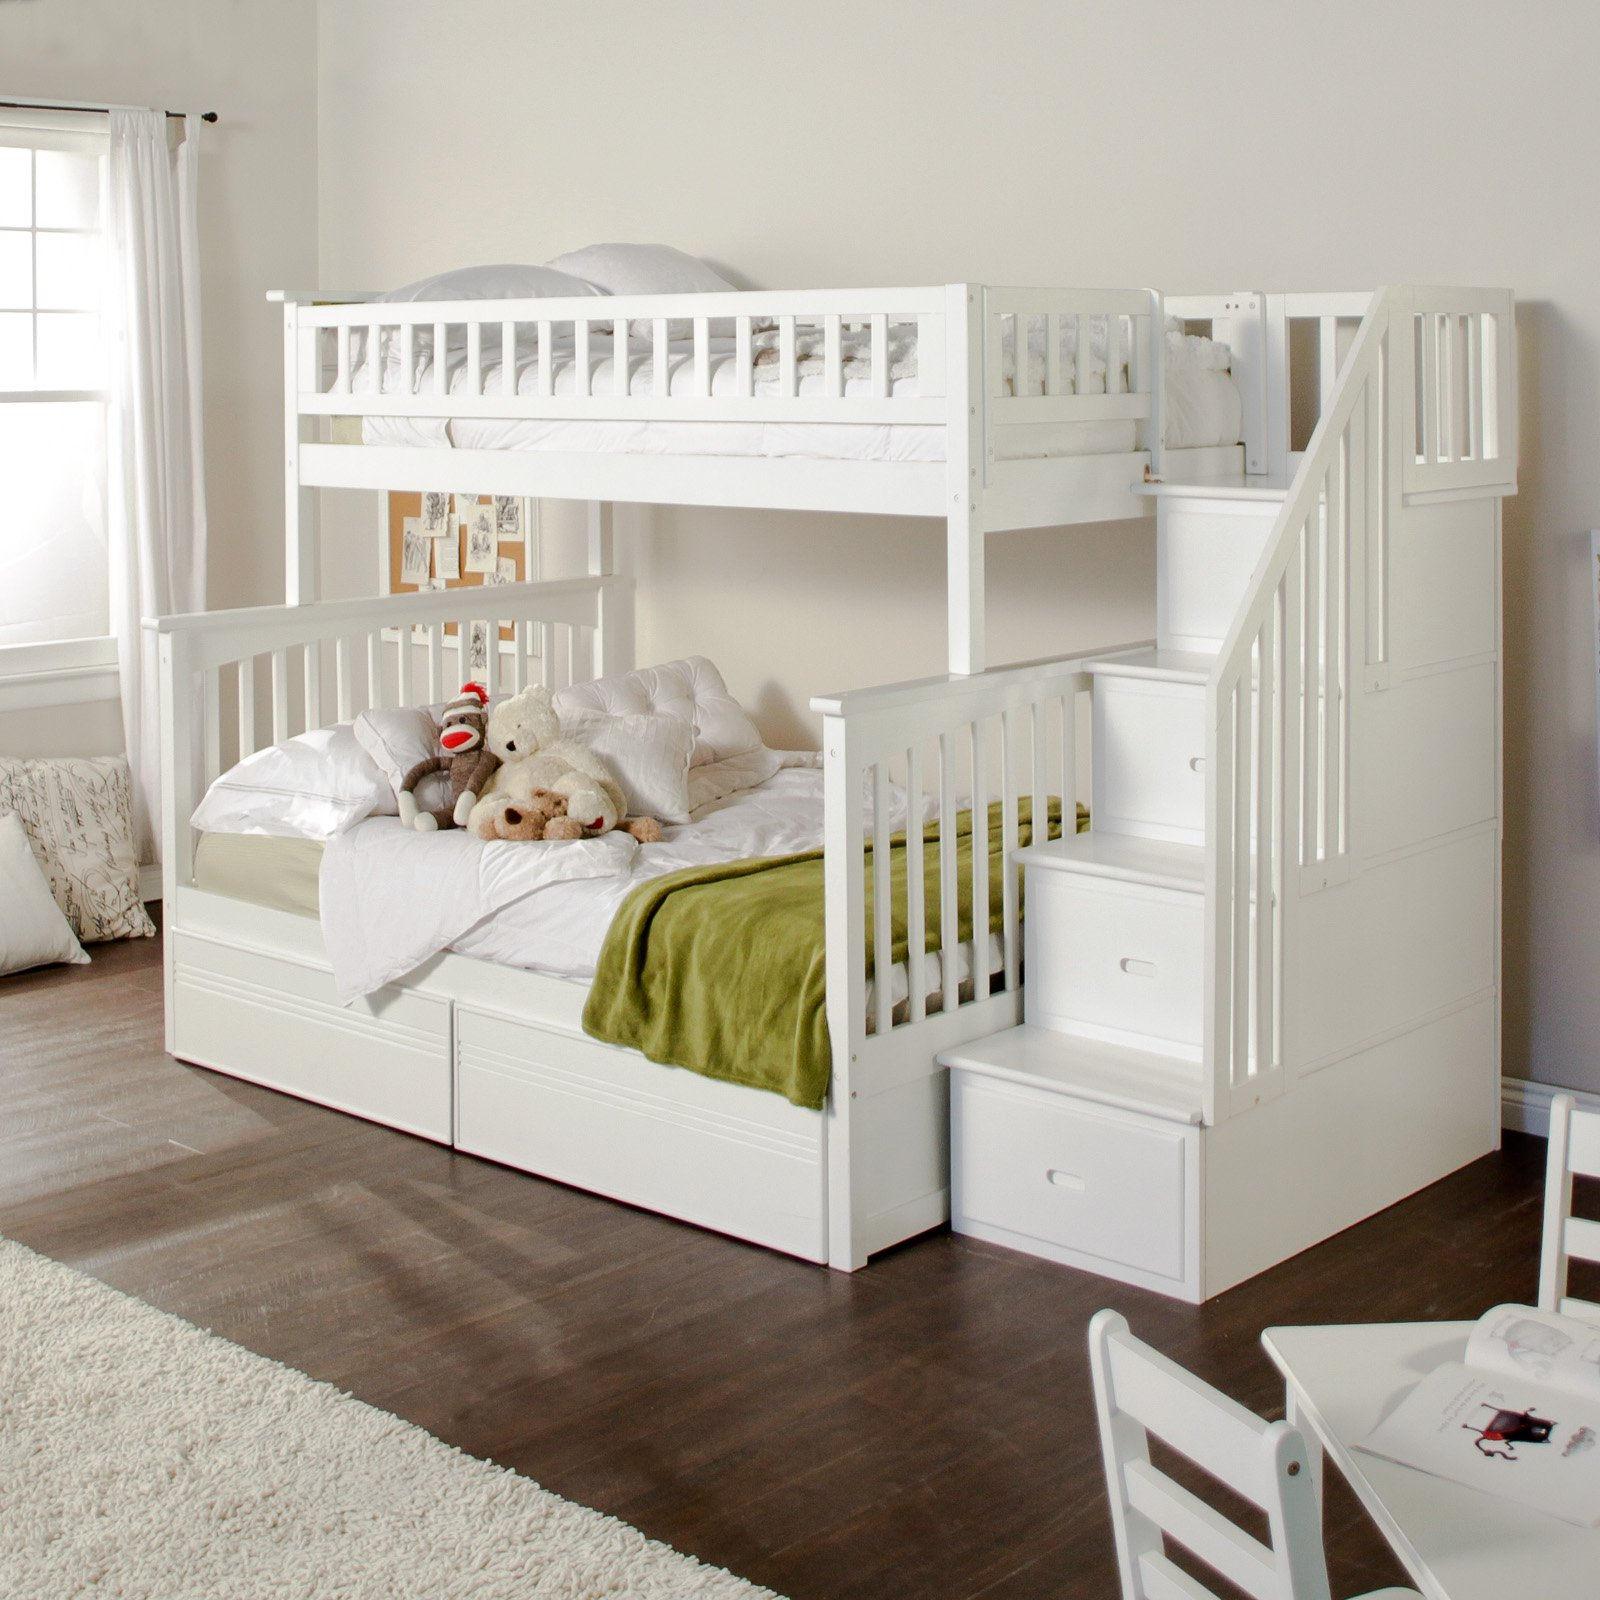 Tempat Tidur Tingkat Minimalis Ranjang Susun Anak 3 Bed Kayu Jati Halaman 1 Kompasiana Com